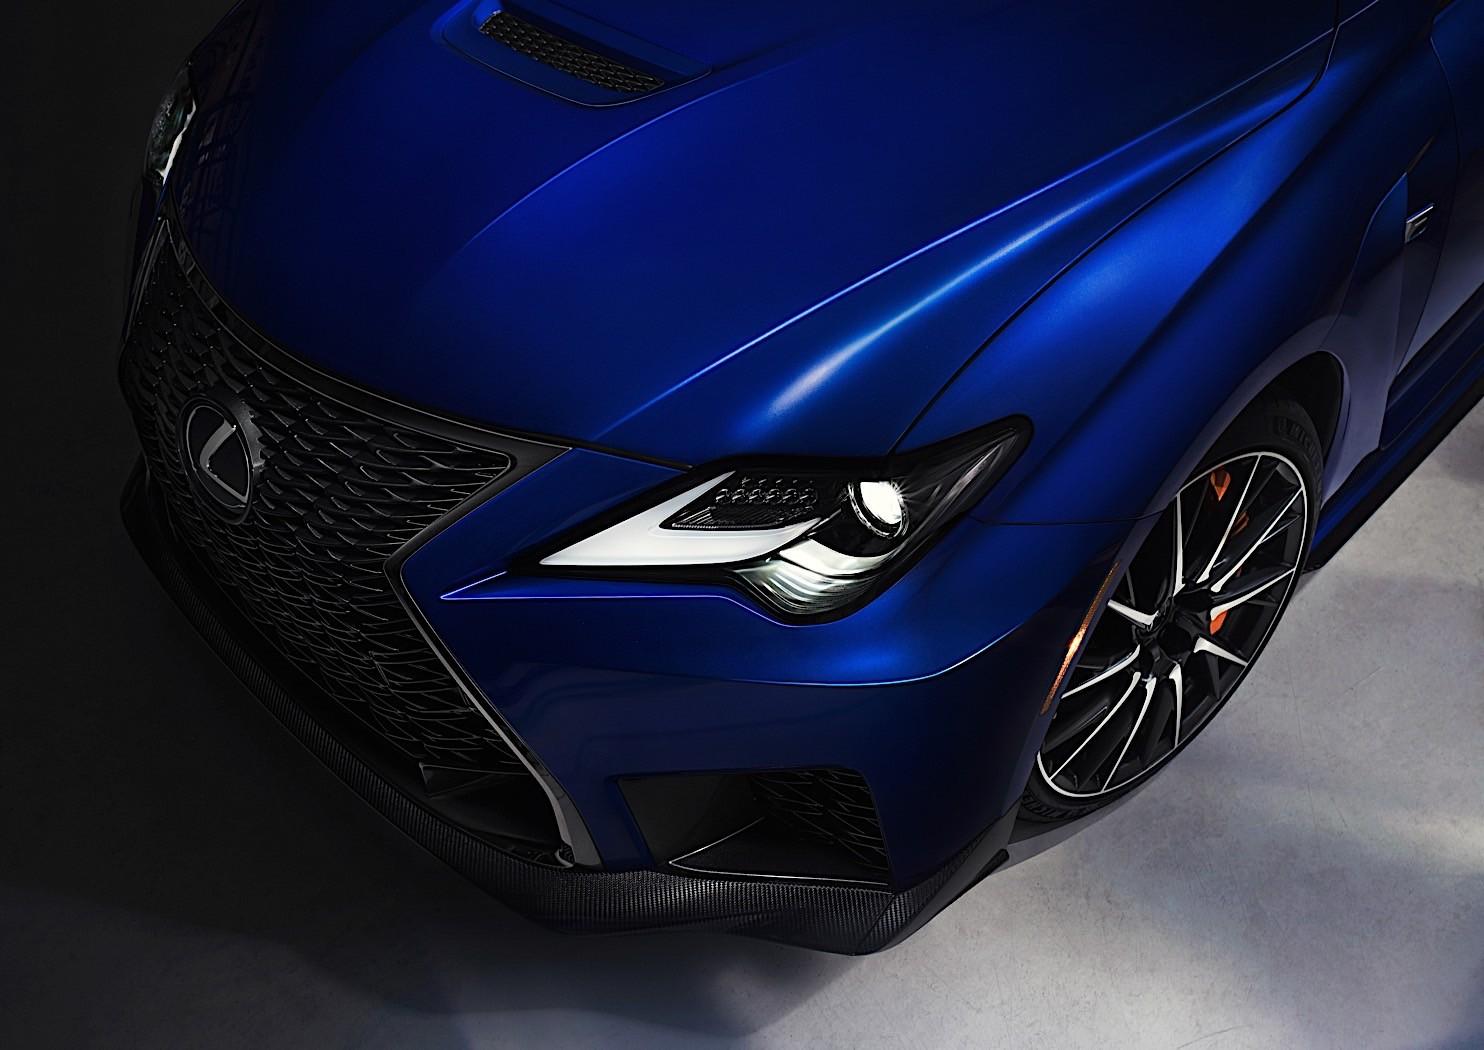 2020 Lexus Rc F Readies For Detroit Auto Show Debut With Track Edition Autoevolution